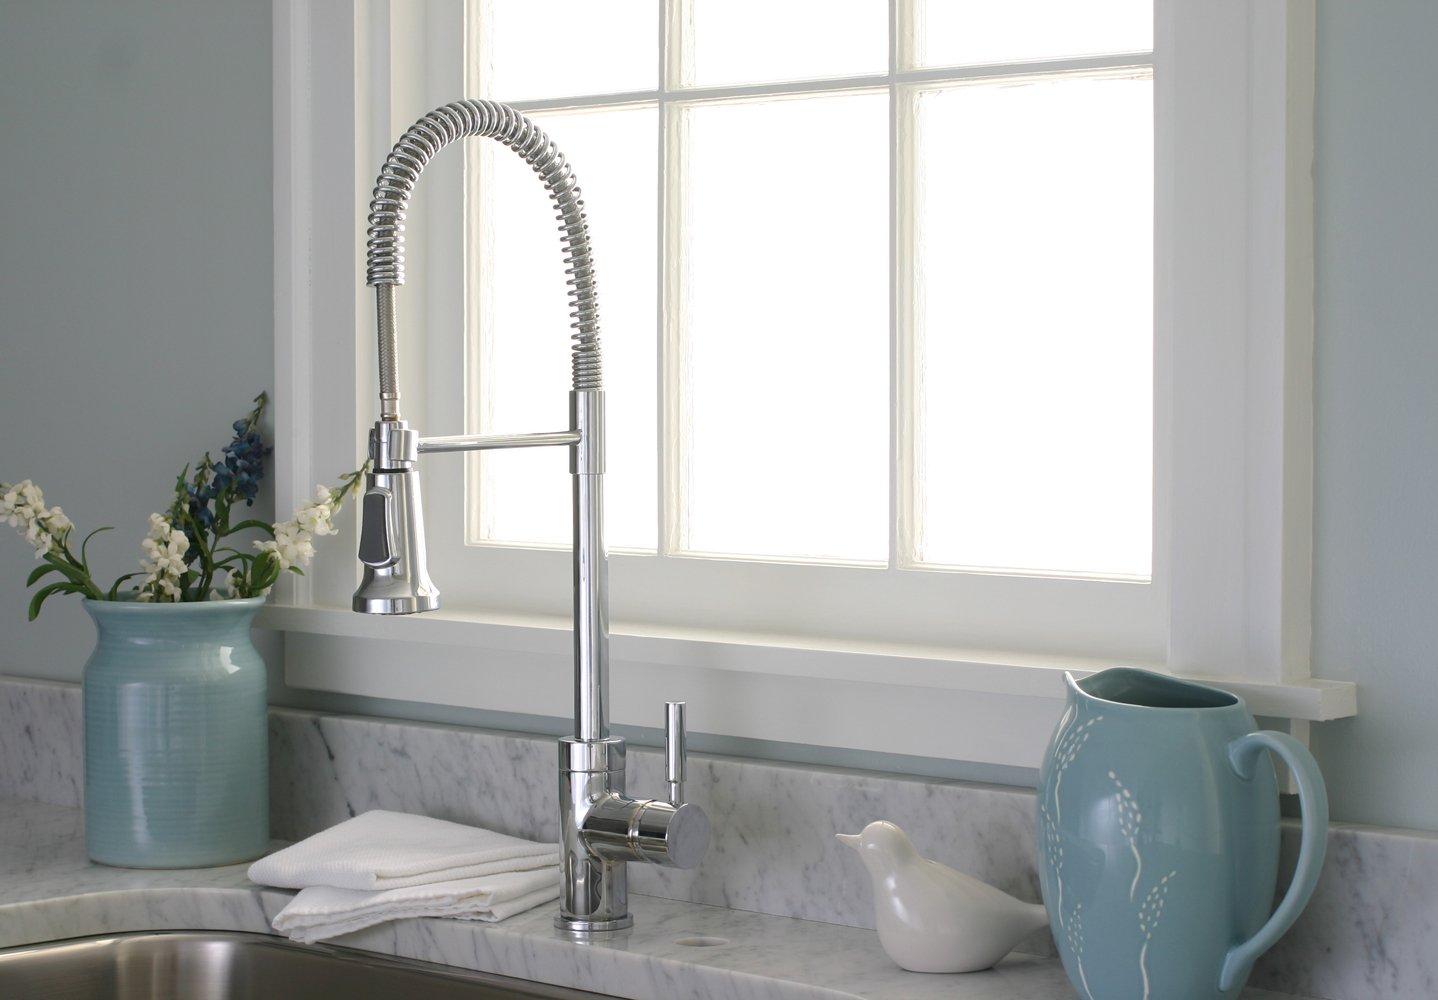 Premier 120333 Essen Single Handle Commercial Style Pull Down Kitchen Faucet,  Chrome   Touch On Kitchen Sink Faucets   Amazon.com